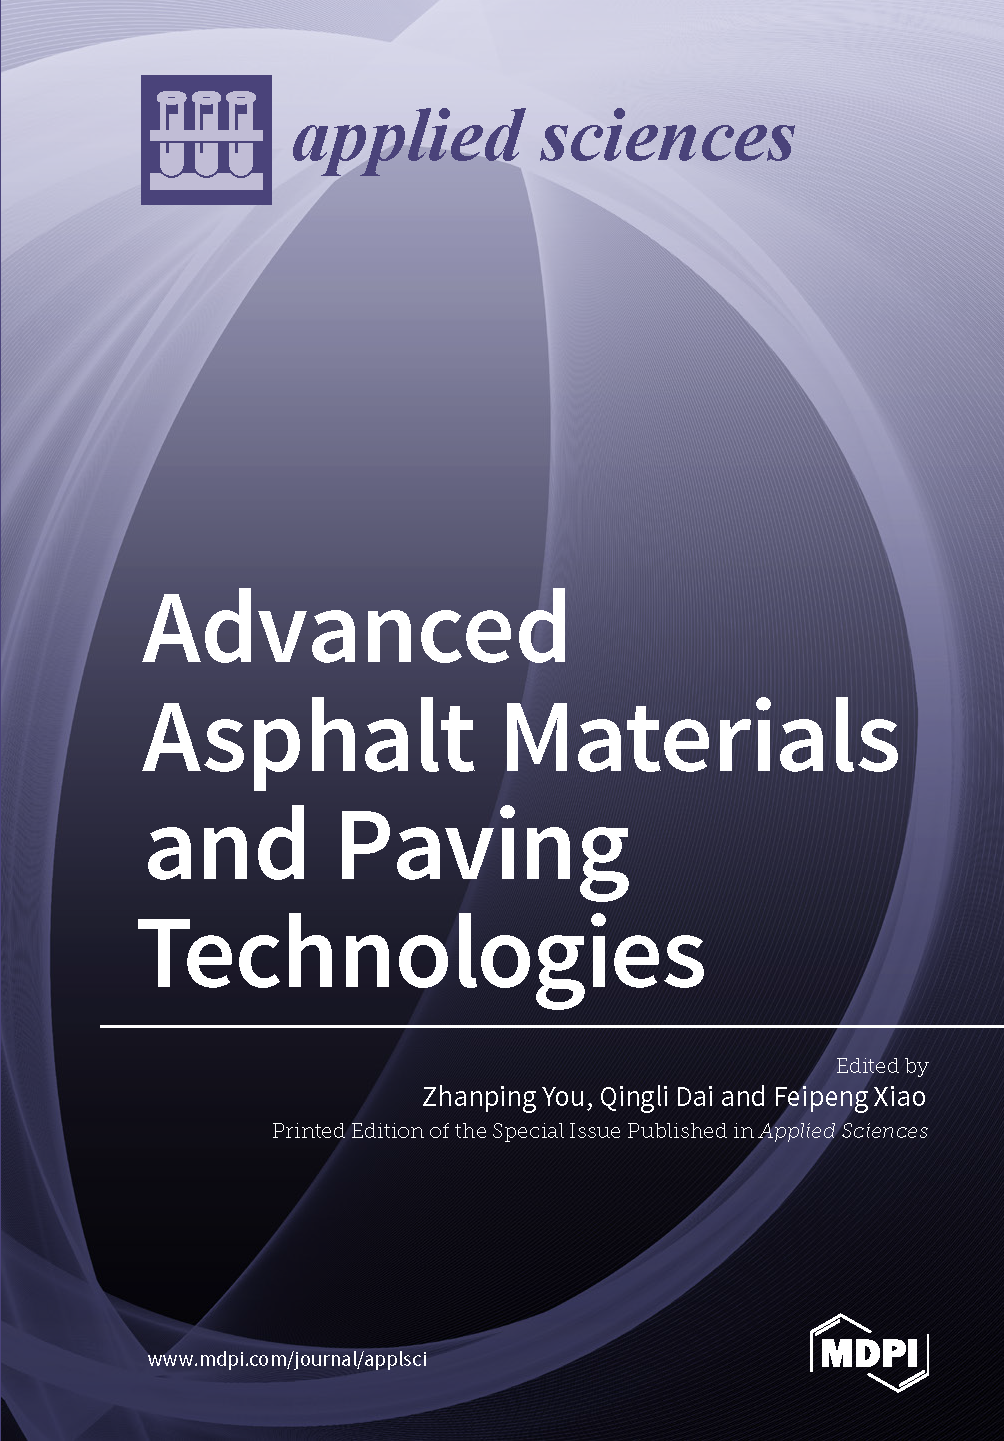 Advanced Asphalt Materials and Paving Technologies